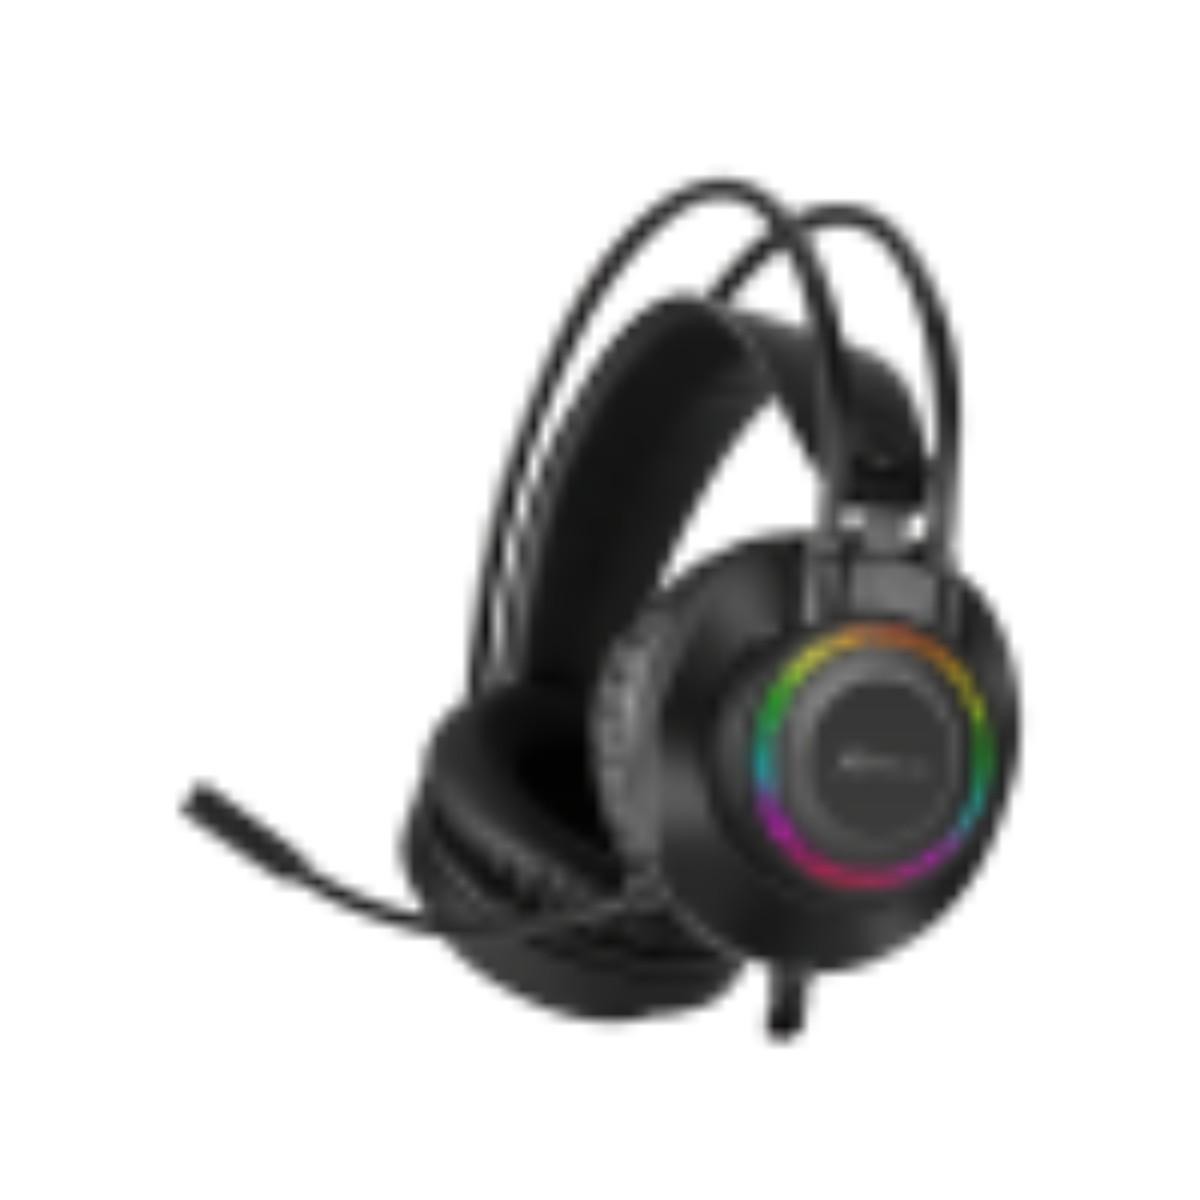 auriculares estereo para gaming 3 100x100 1